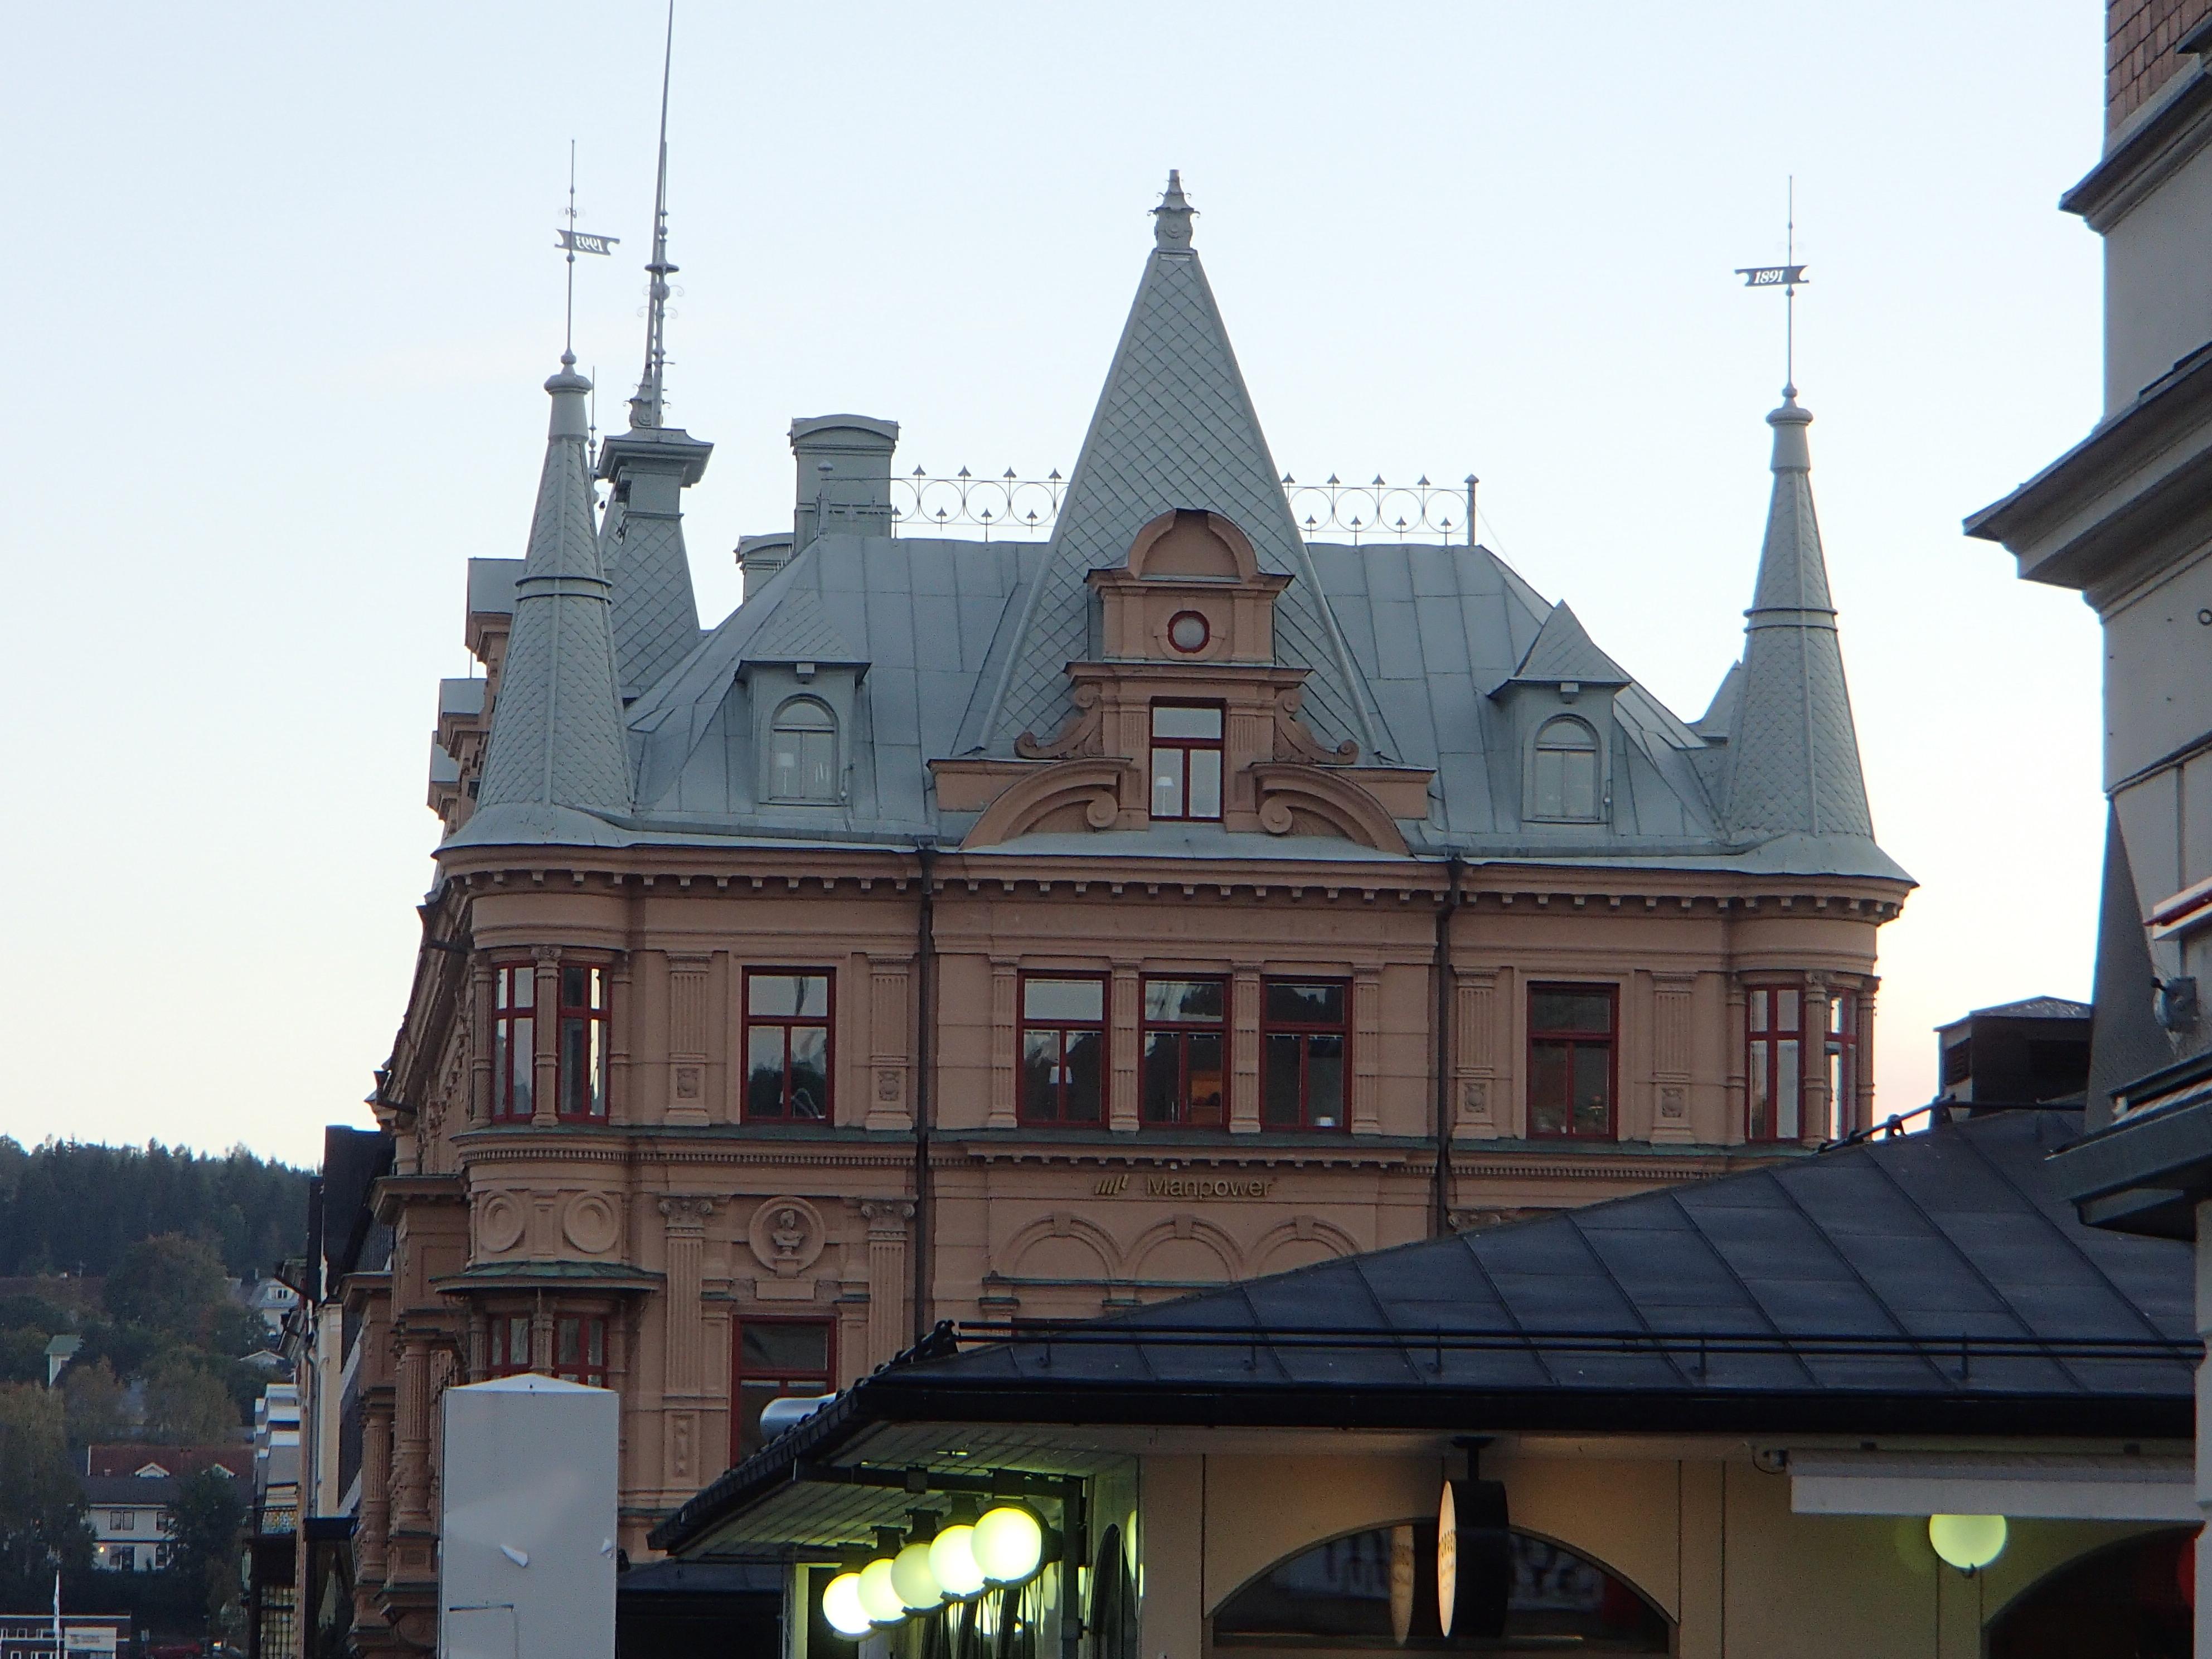 Sweden House Hotel